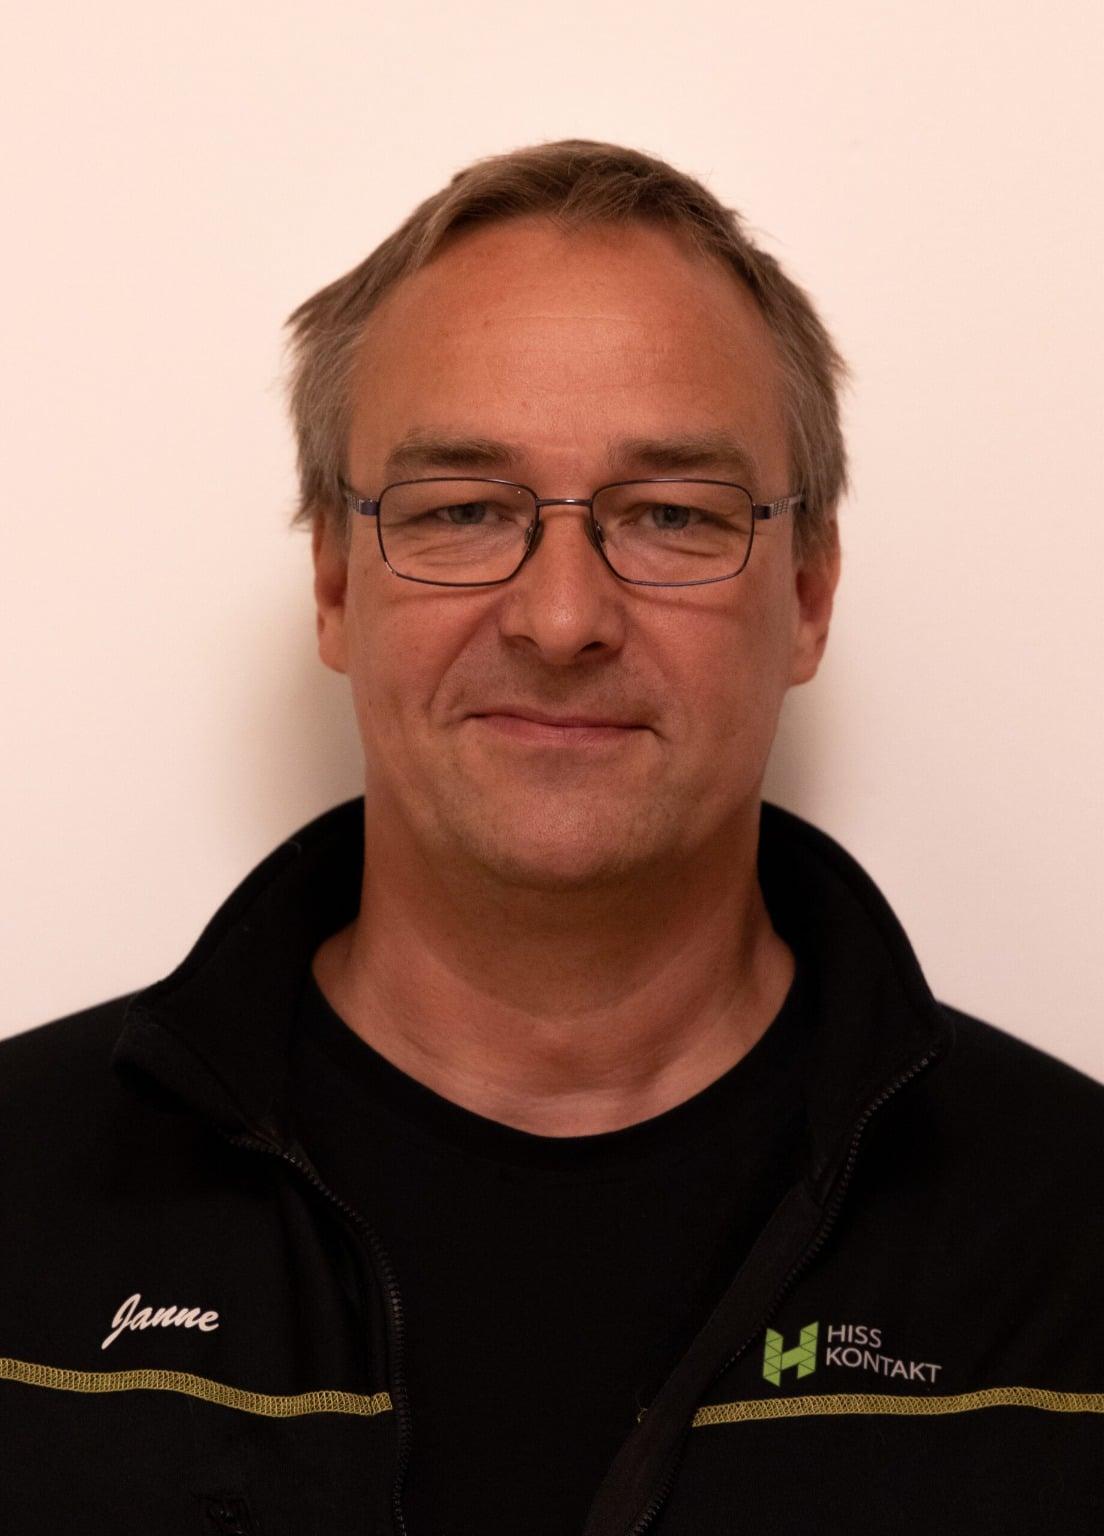 Janne Lengman